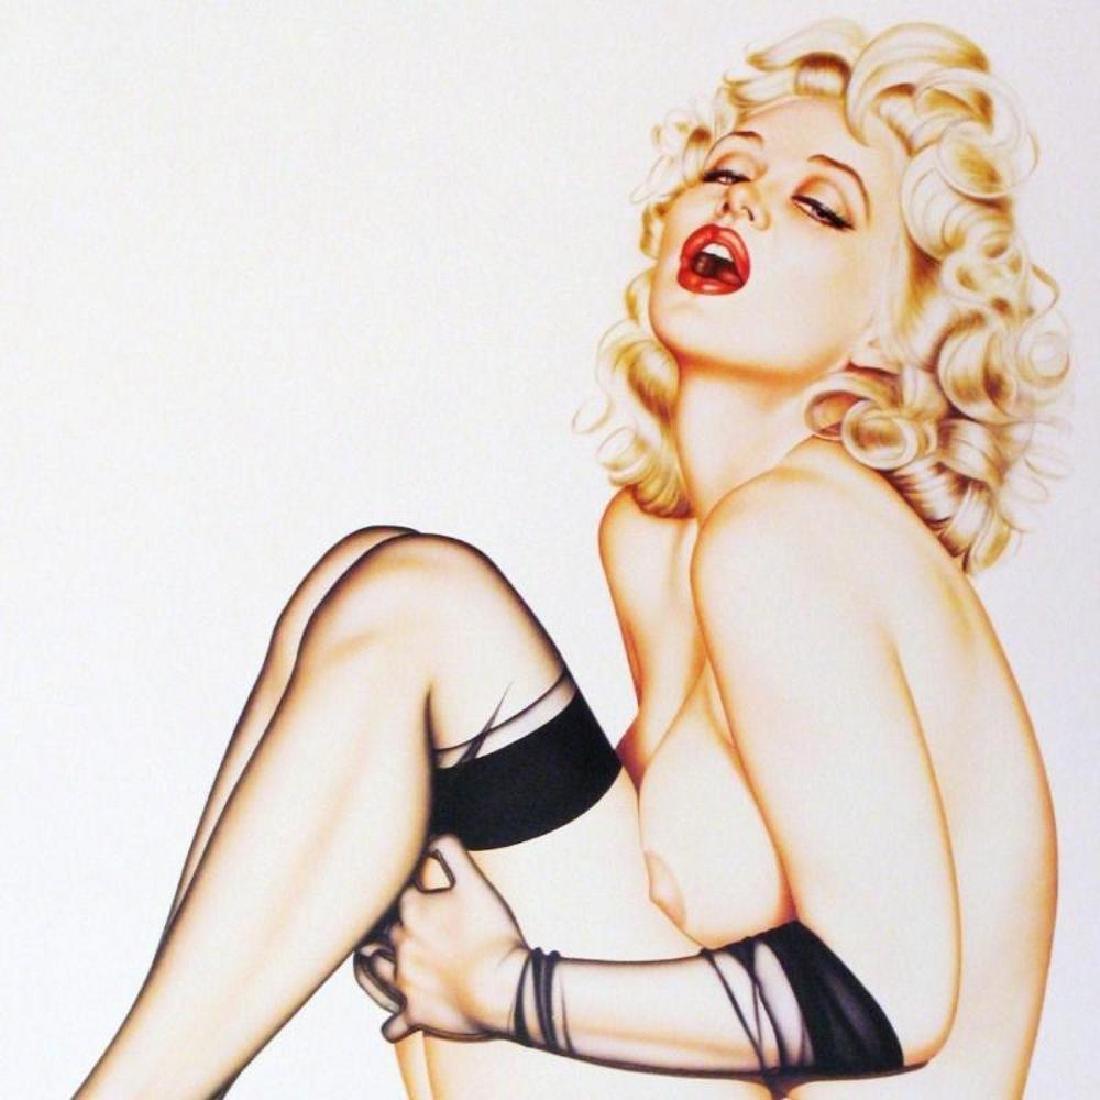 Sugar Puss Pin Up Olivia Signed Ltd Ed Nude Litho - 3